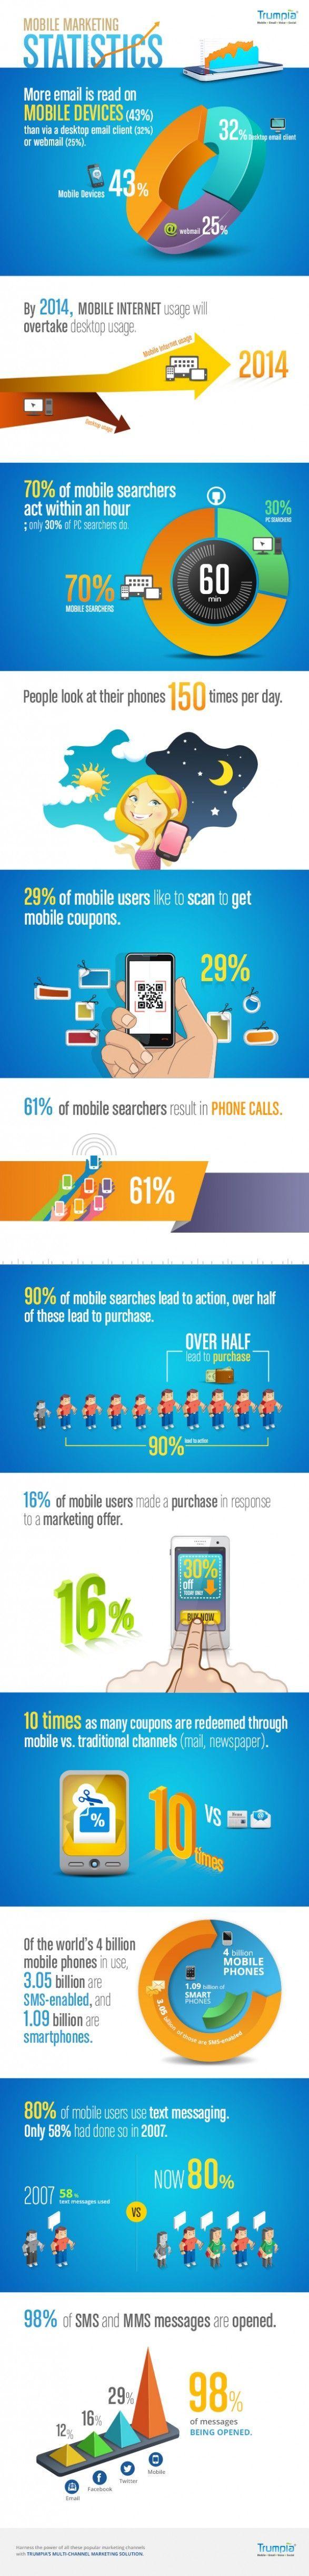 Estatísticas de Mobile Marketing